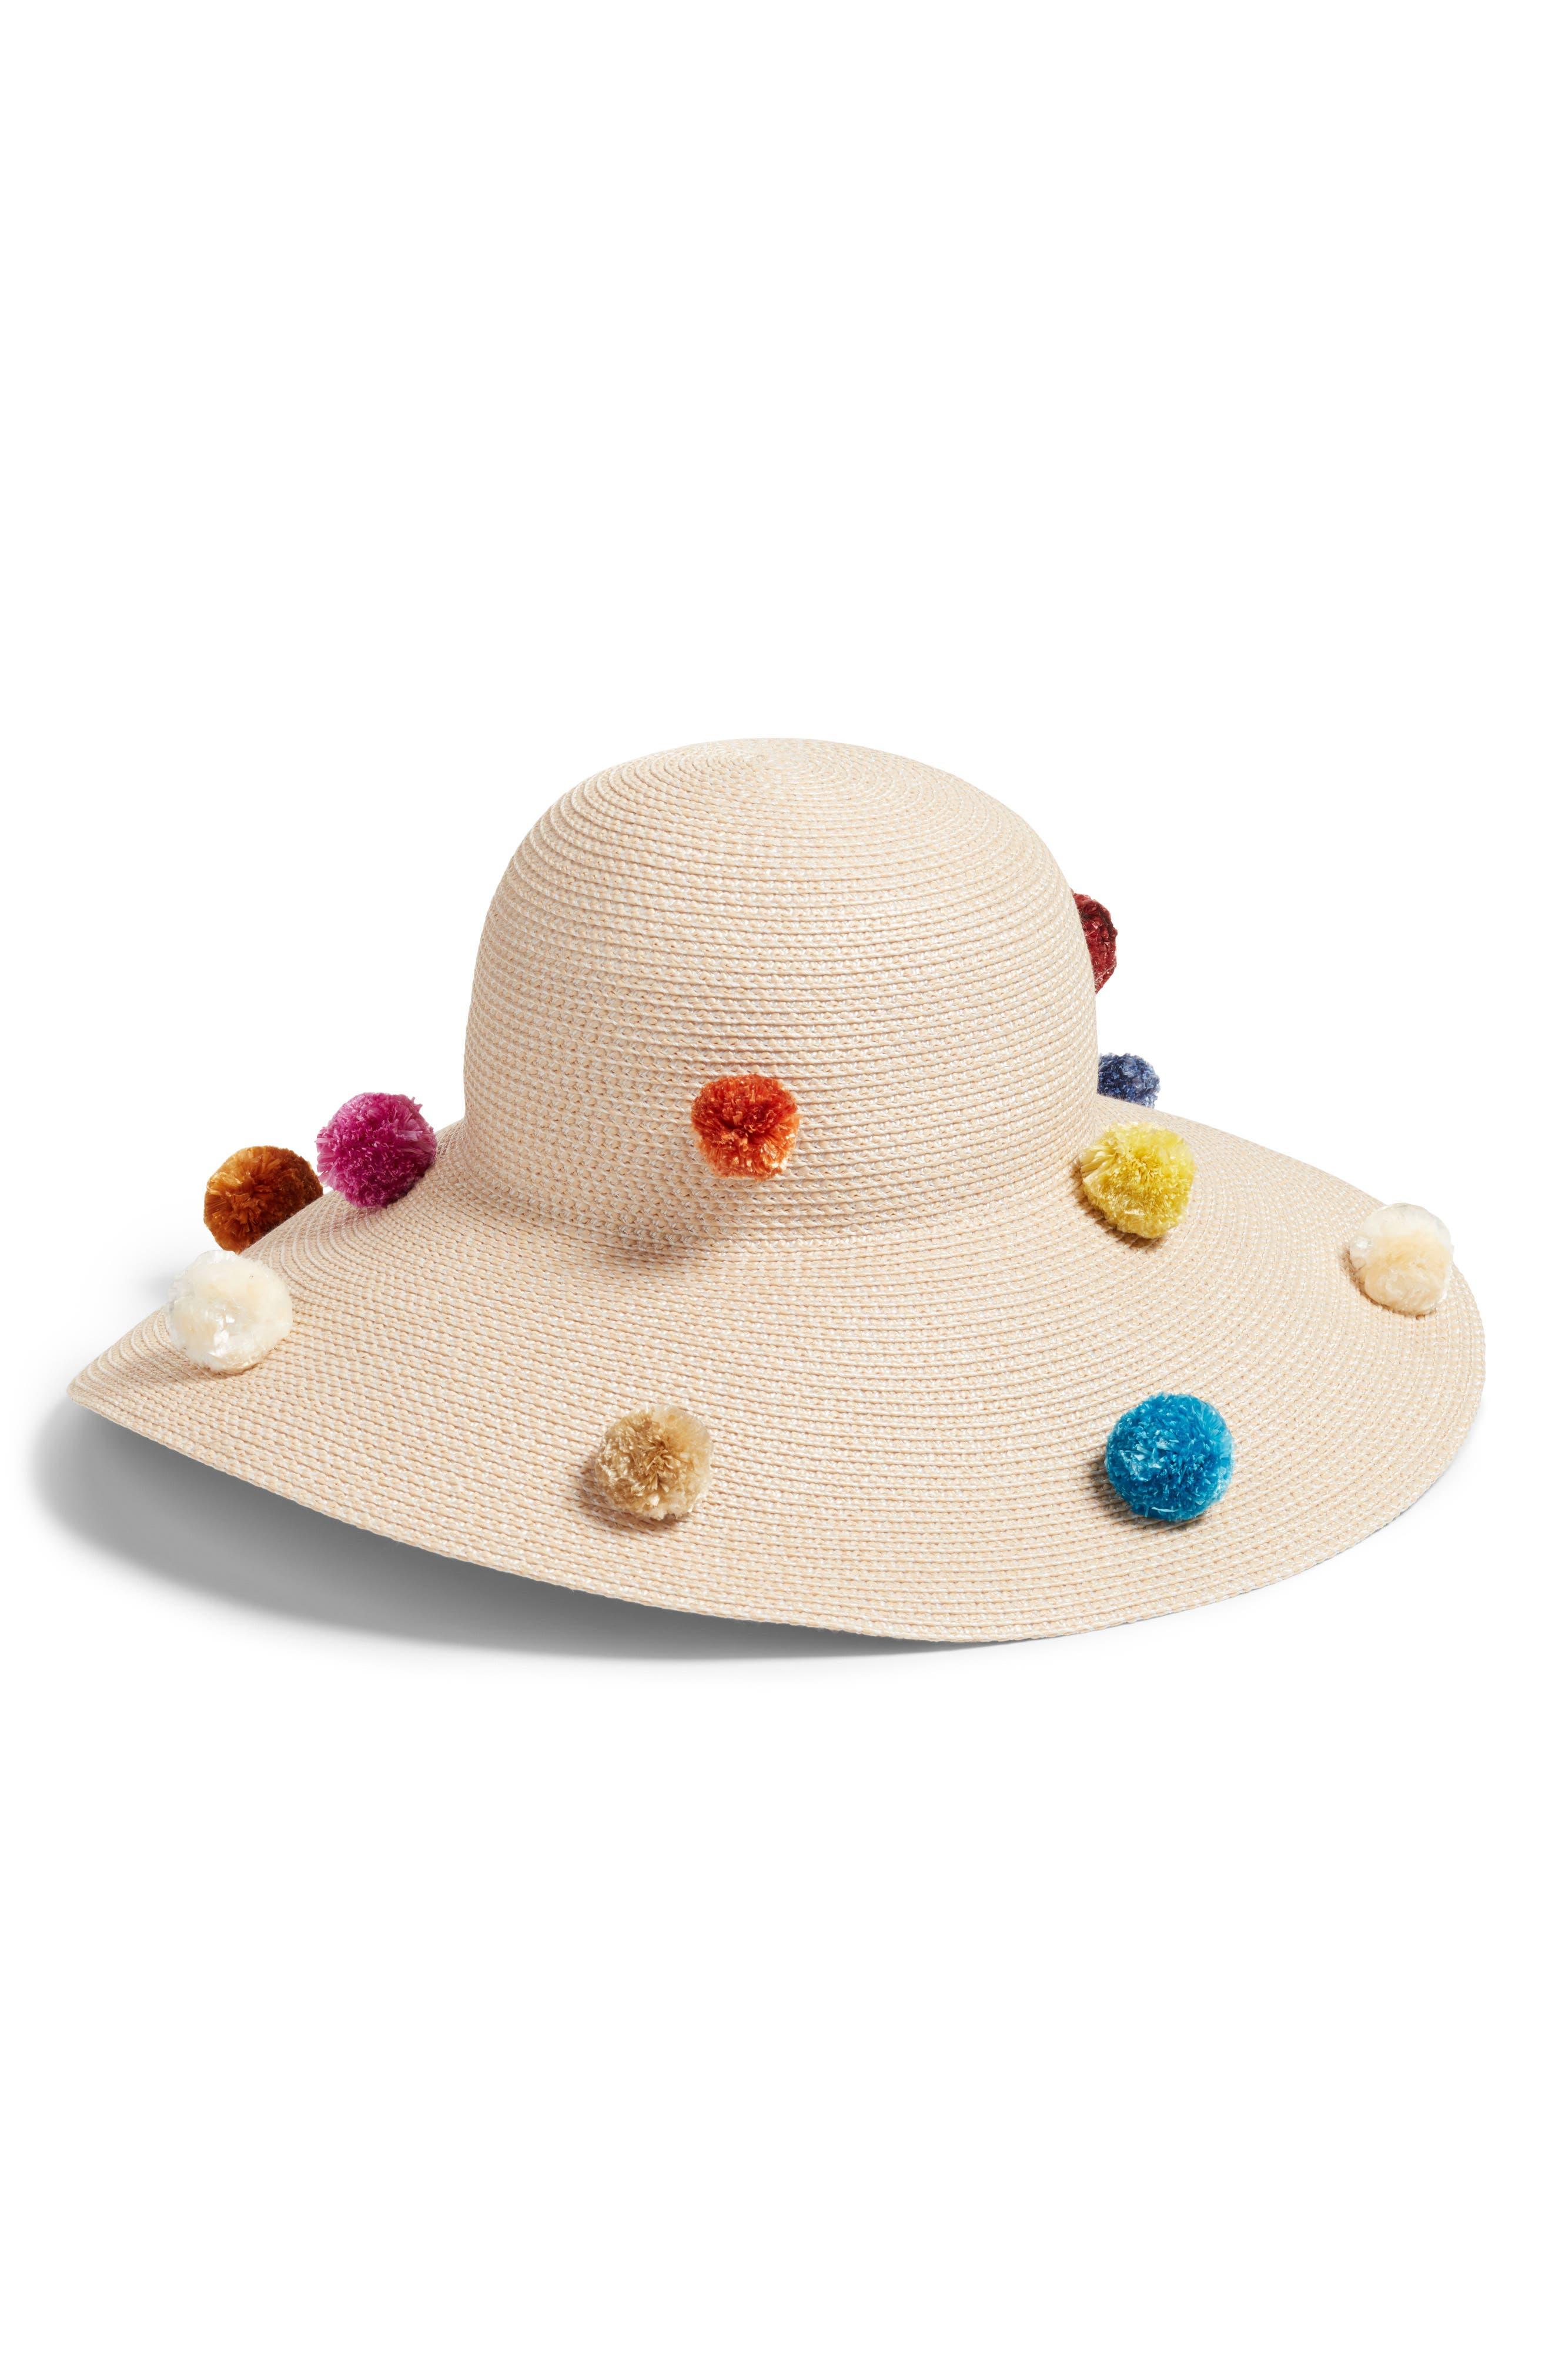 Pompom Bella Squishee<sup>®</sup> Sun Hat,                         Main,                         color, Cream Mix